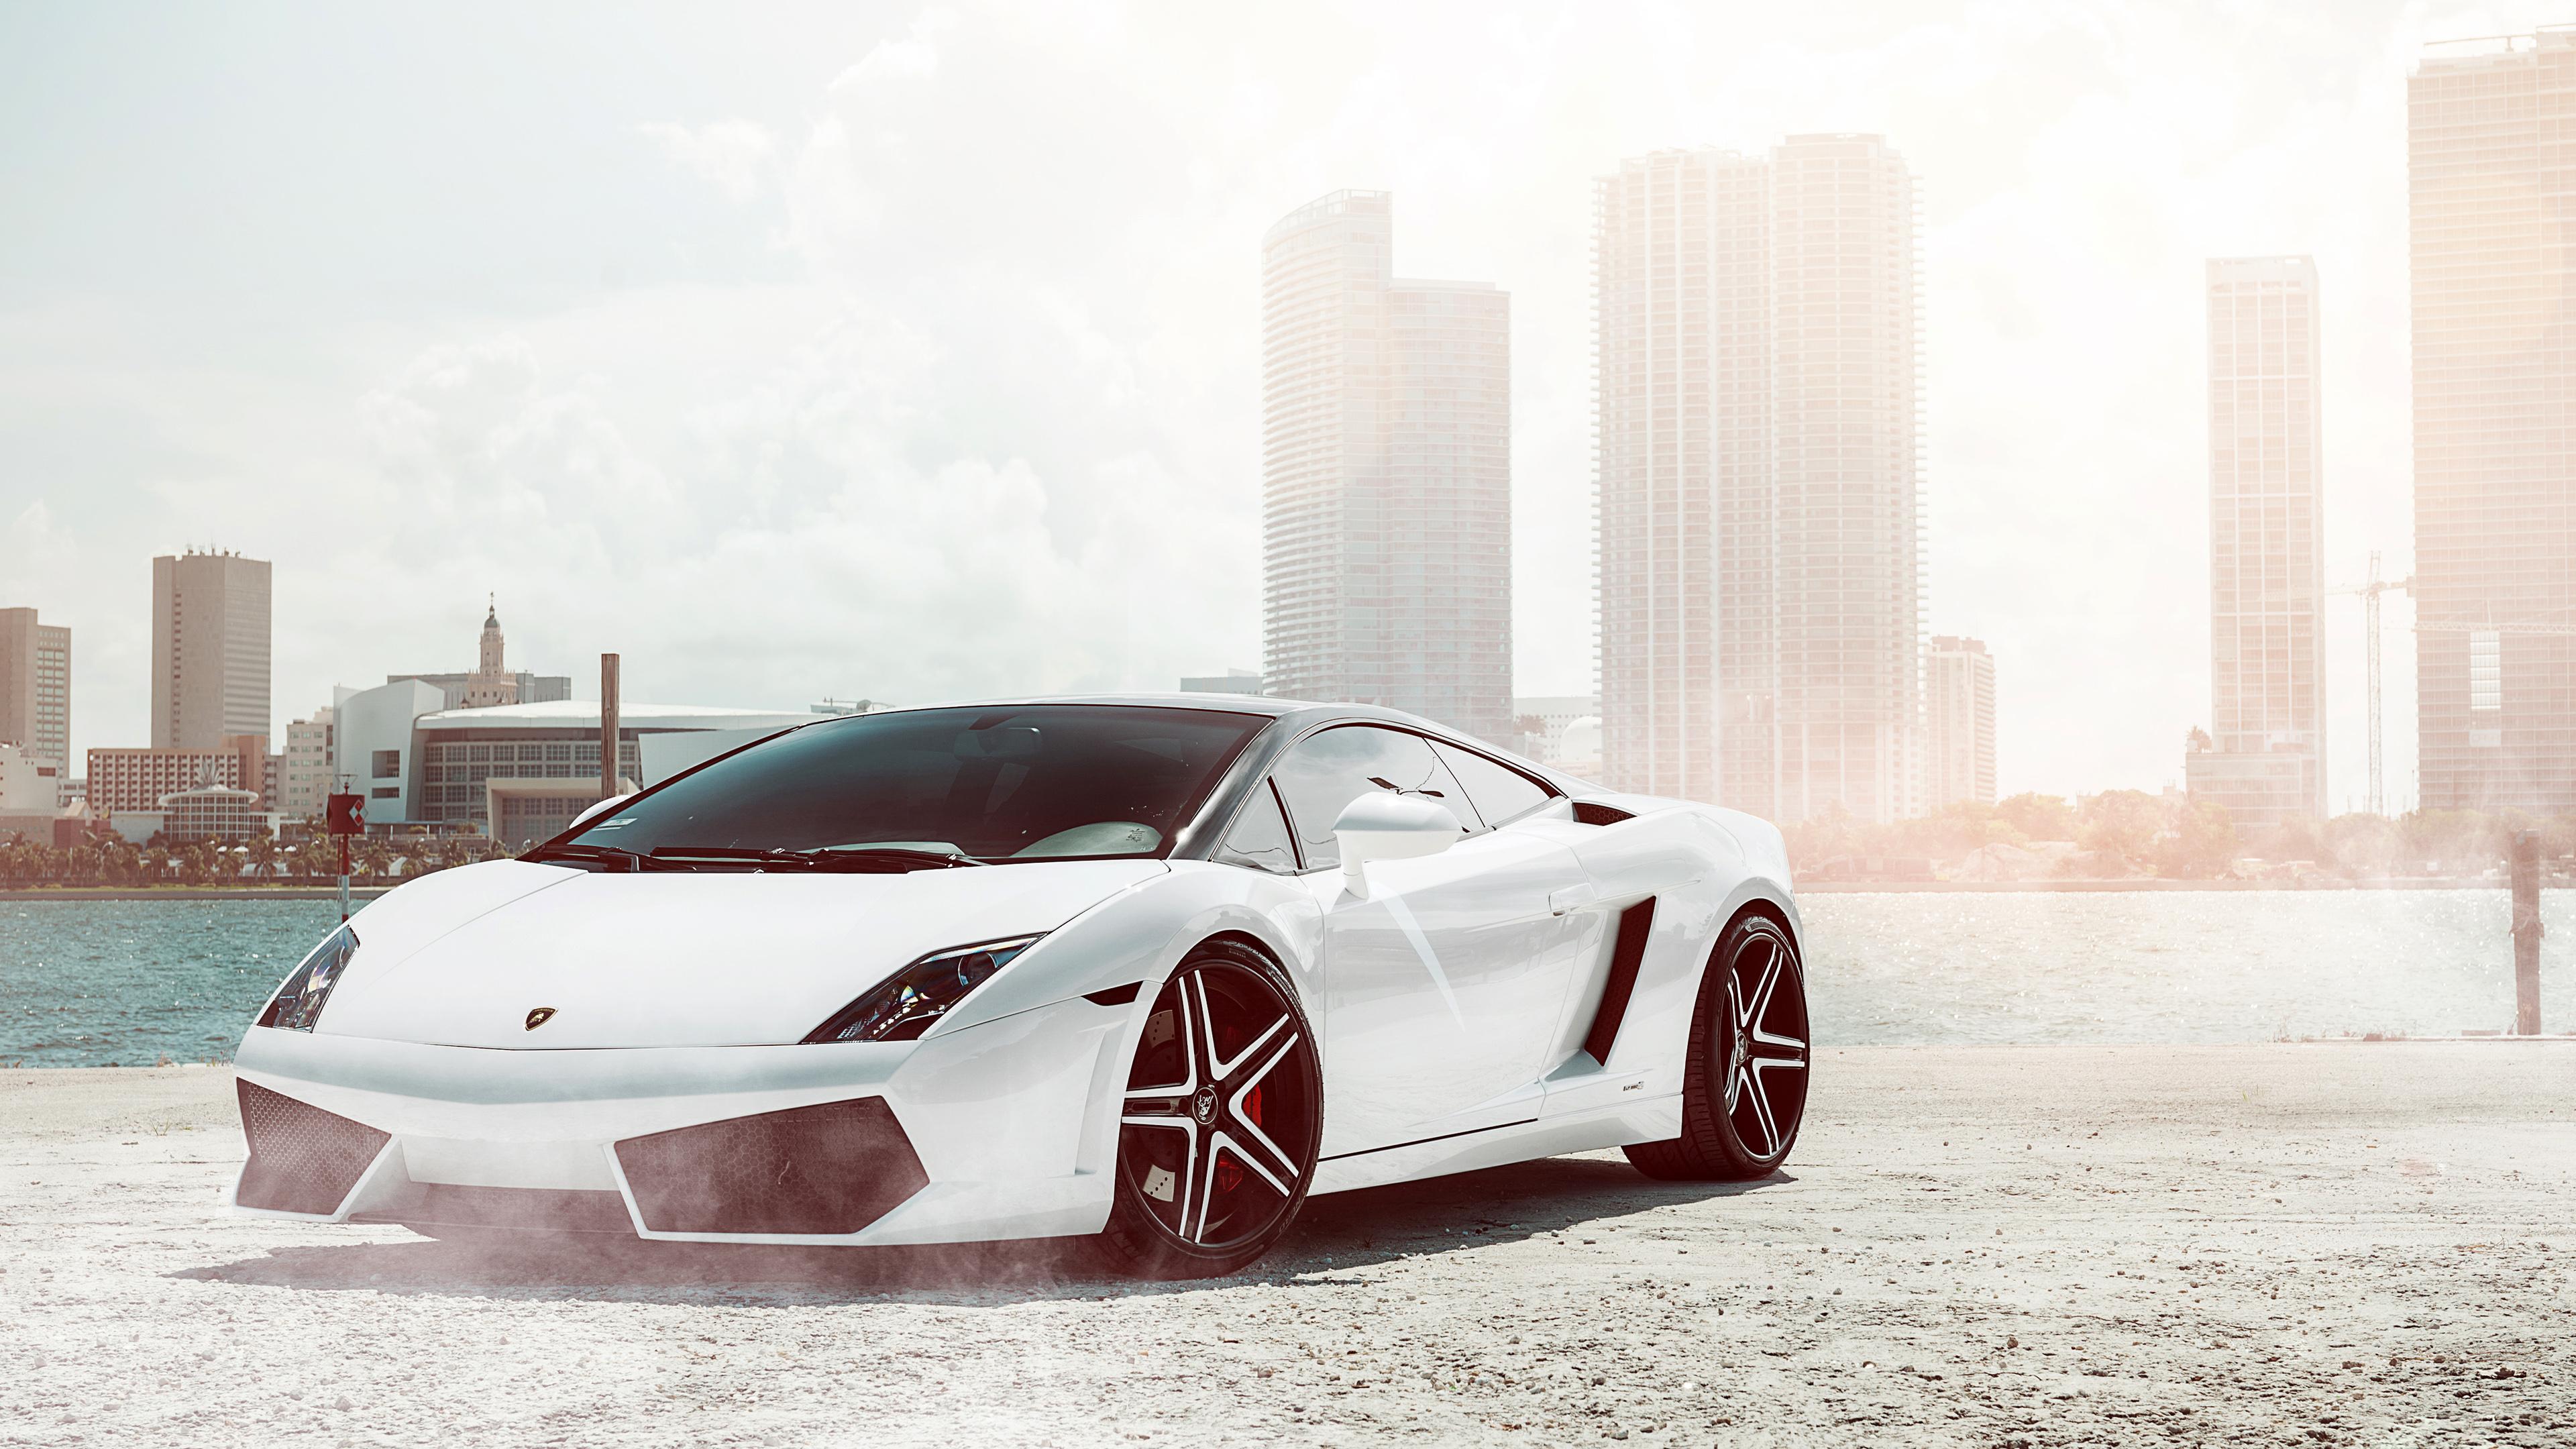 Lamborghini White Wallpapers Hd Pixelstalk Net - 4k Ultra Hd Cars , HD Wallpaper & Backgrounds